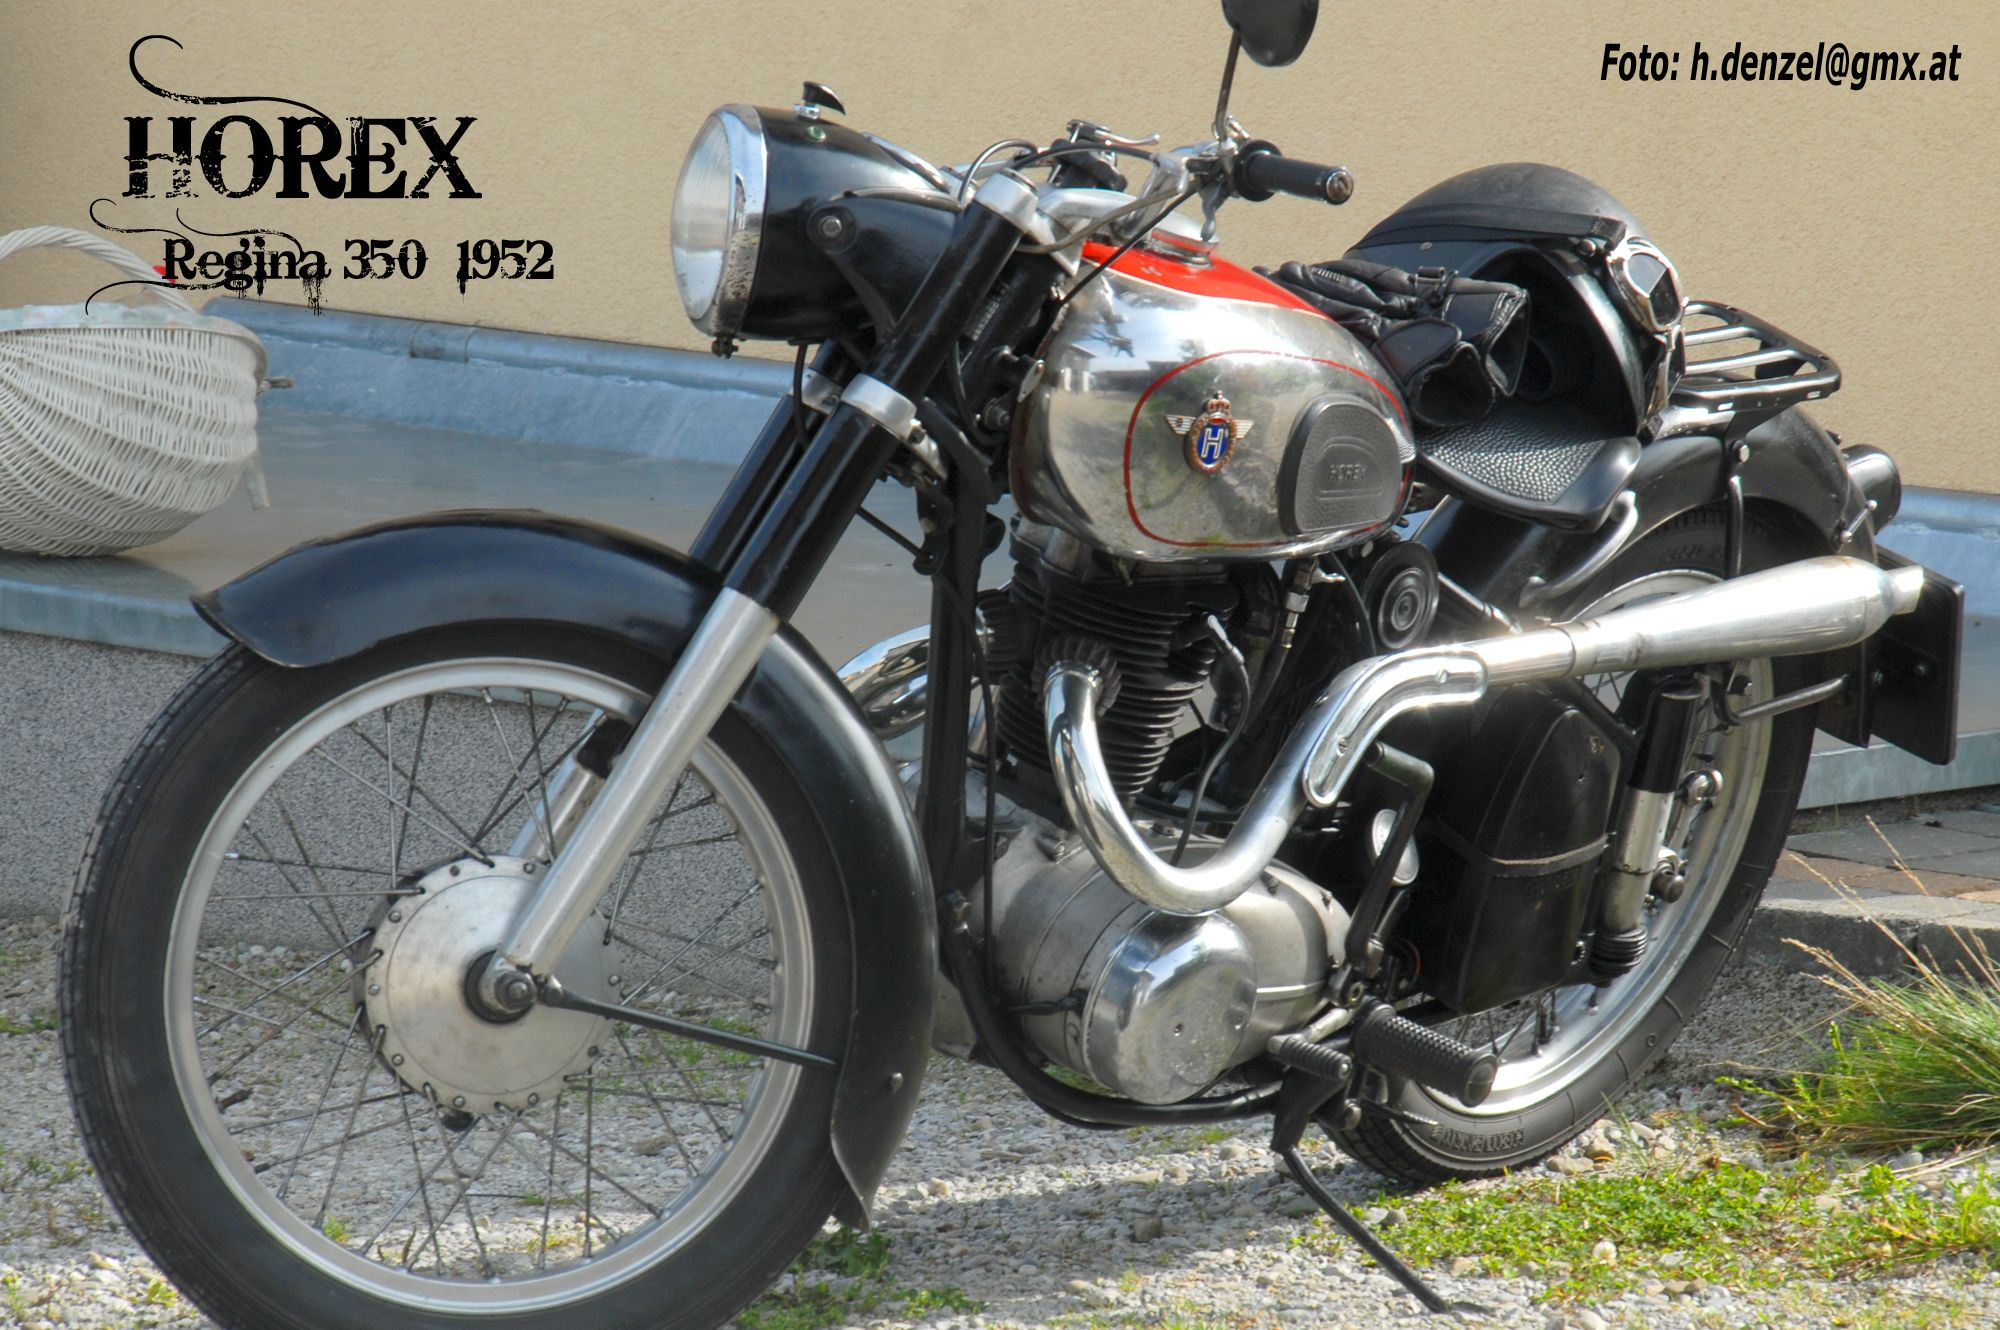 horex regina 350 1952 deutsche motorr der motorcycle. Black Bedroom Furniture Sets. Home Design Ideas